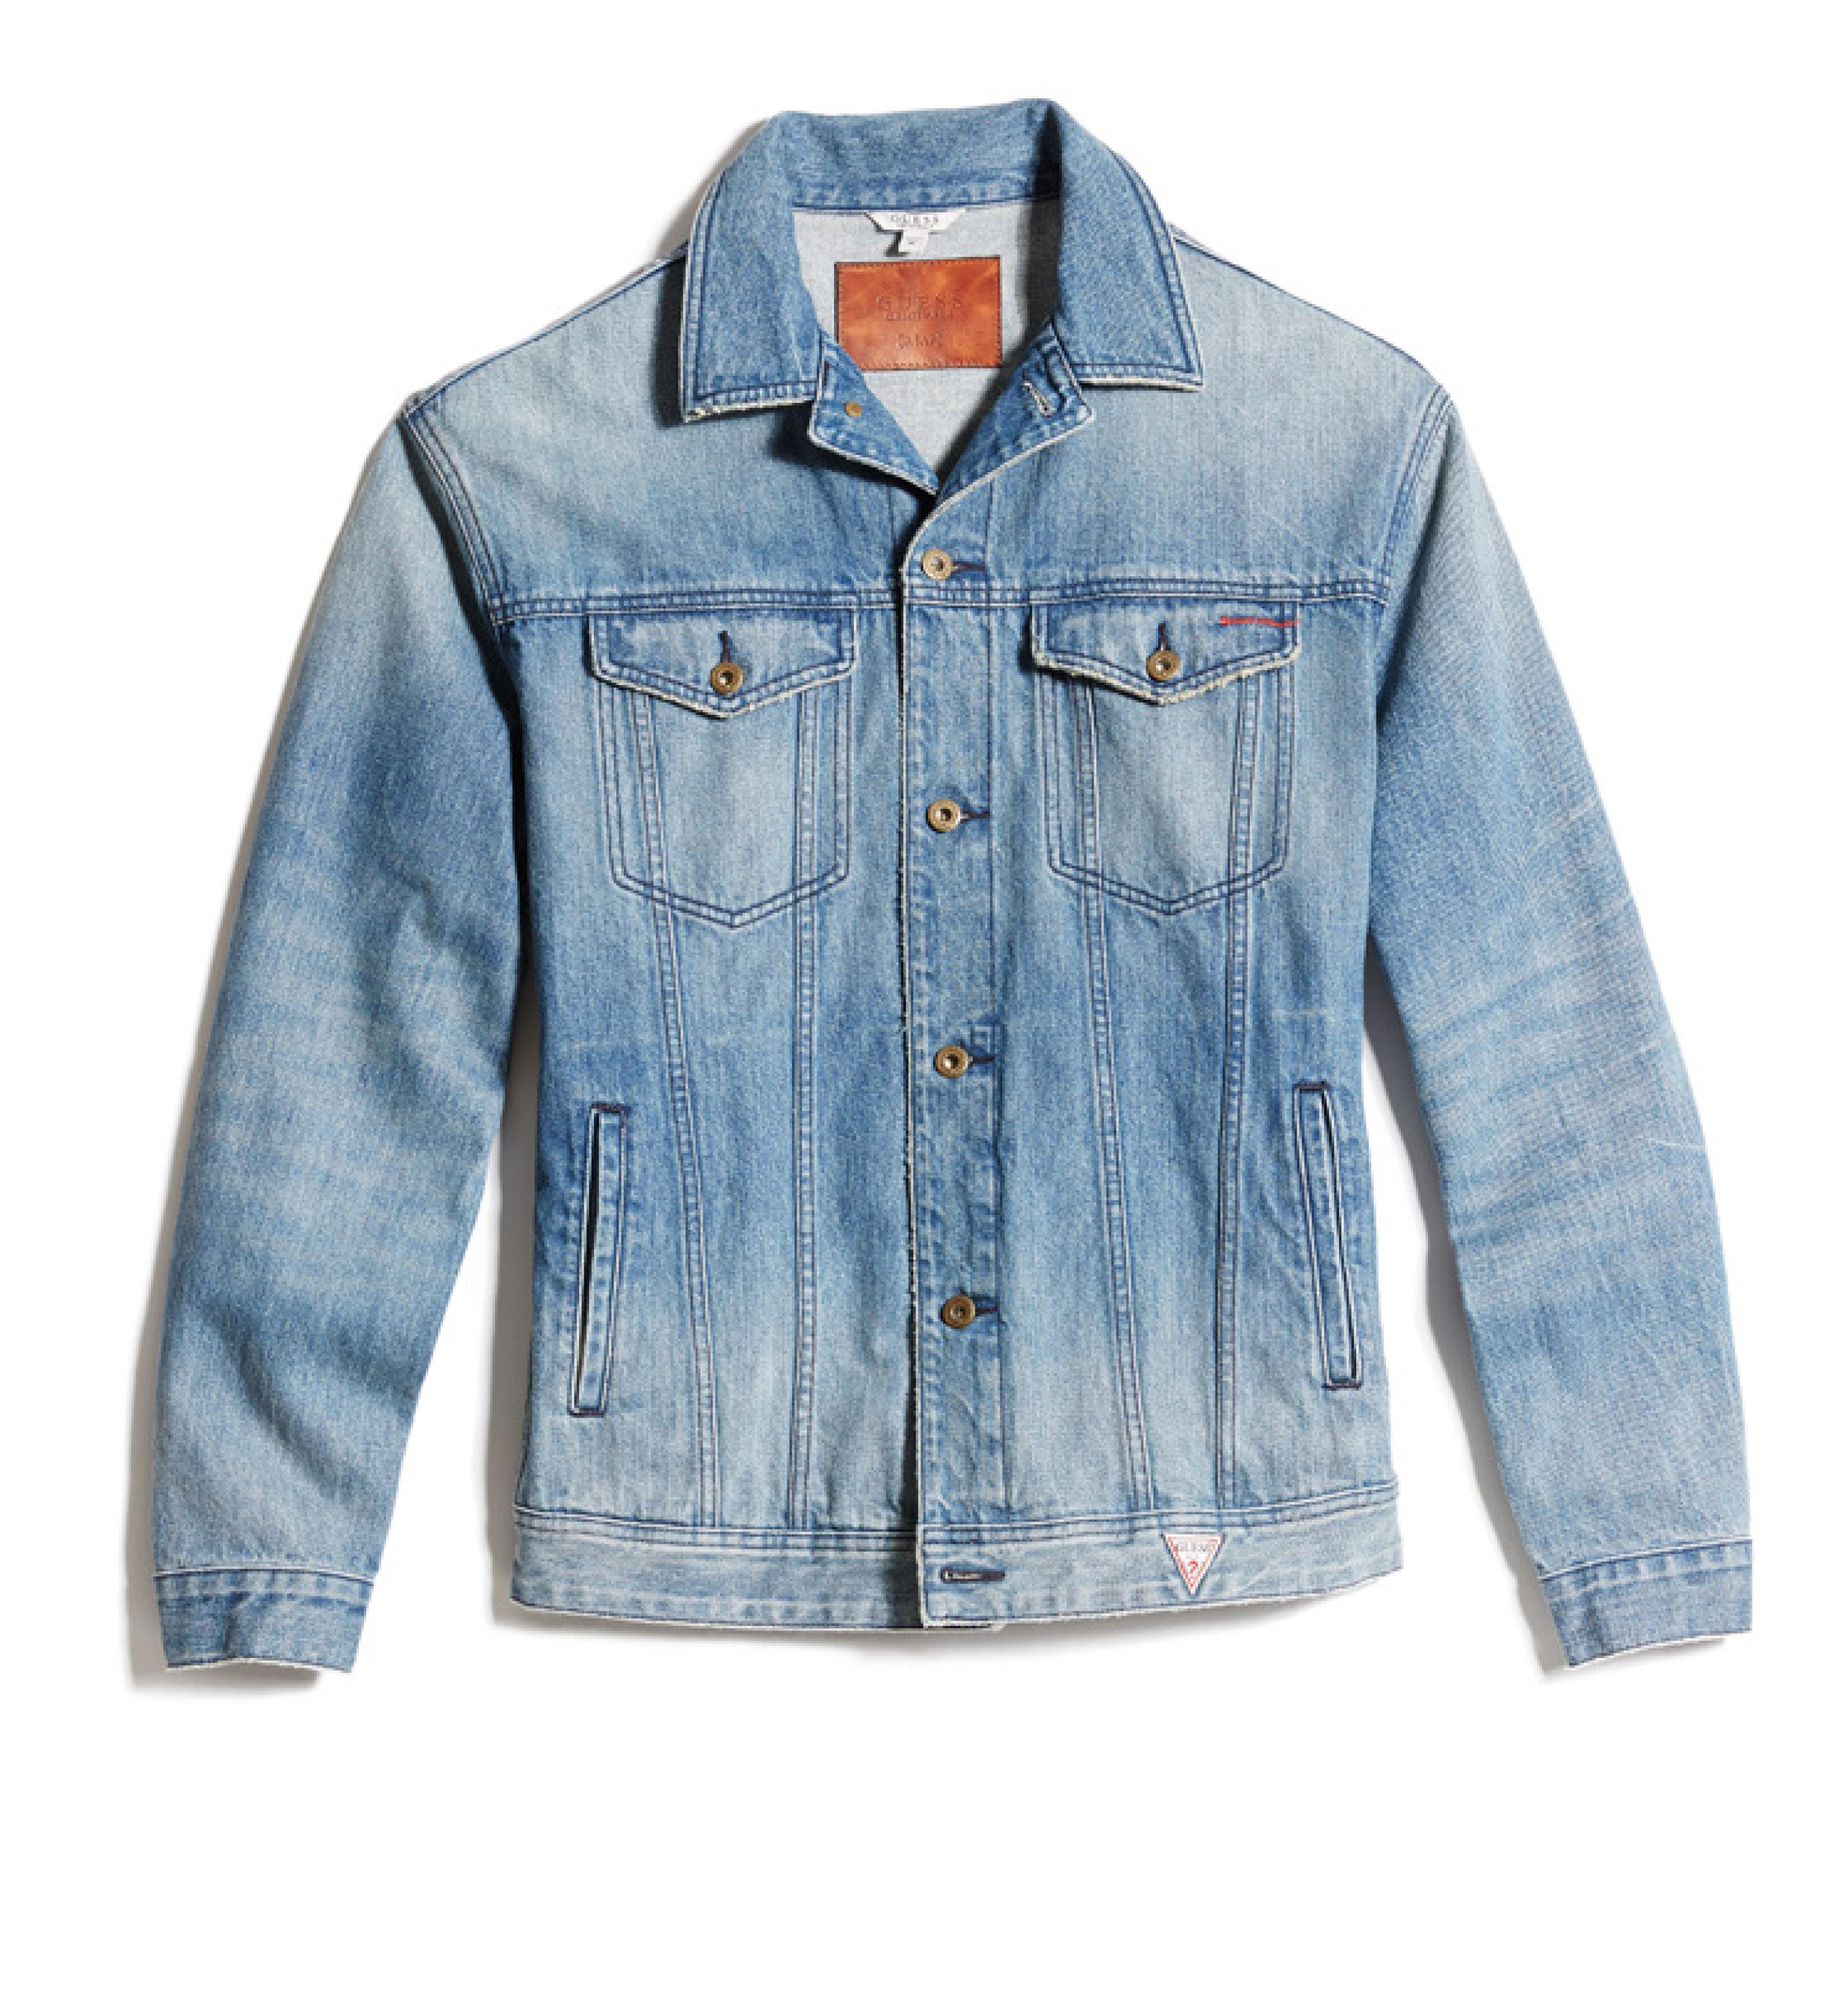 2b5fbdb48 Guess Vintage Wash Denim Jacket | Grailed